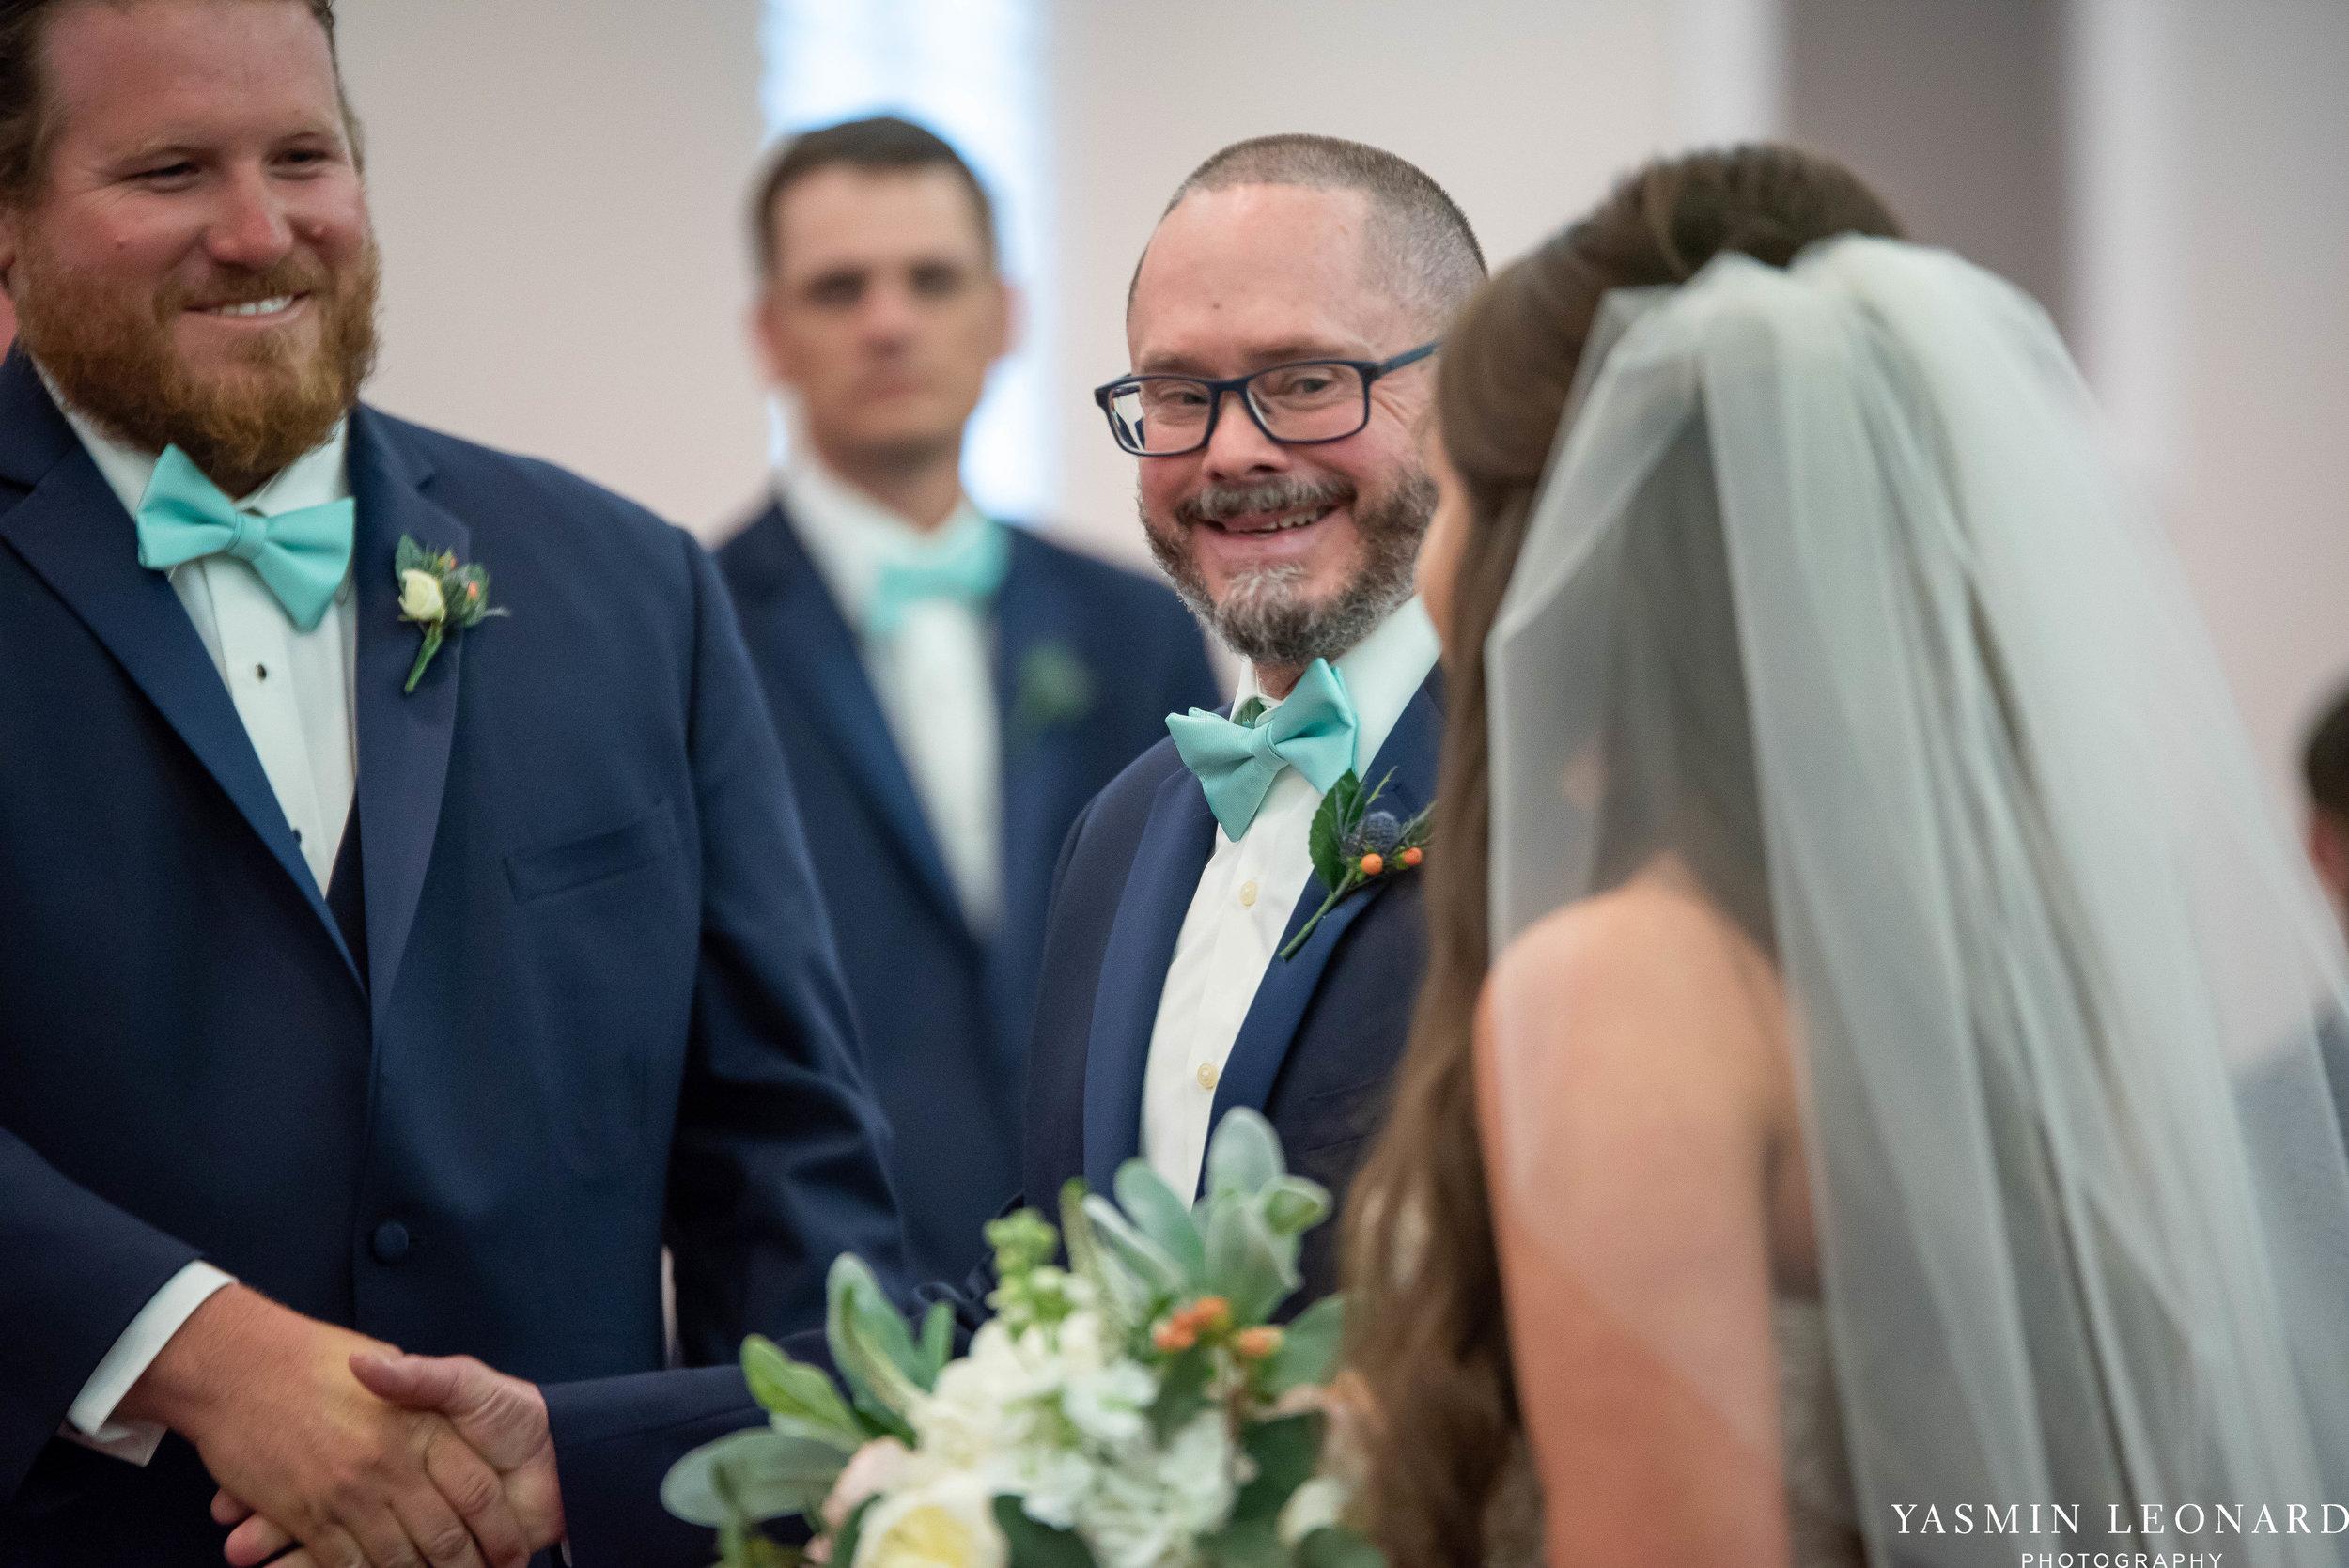 Rain on your wedding day - Rainy Wedding - Plan B for Rain - What to do if it rains on your wedding day - Wedding Inspiration - Outdoor wedding ideas - Rainy Wedding Pictures - Yasmin Leonard Photography-16.jpg